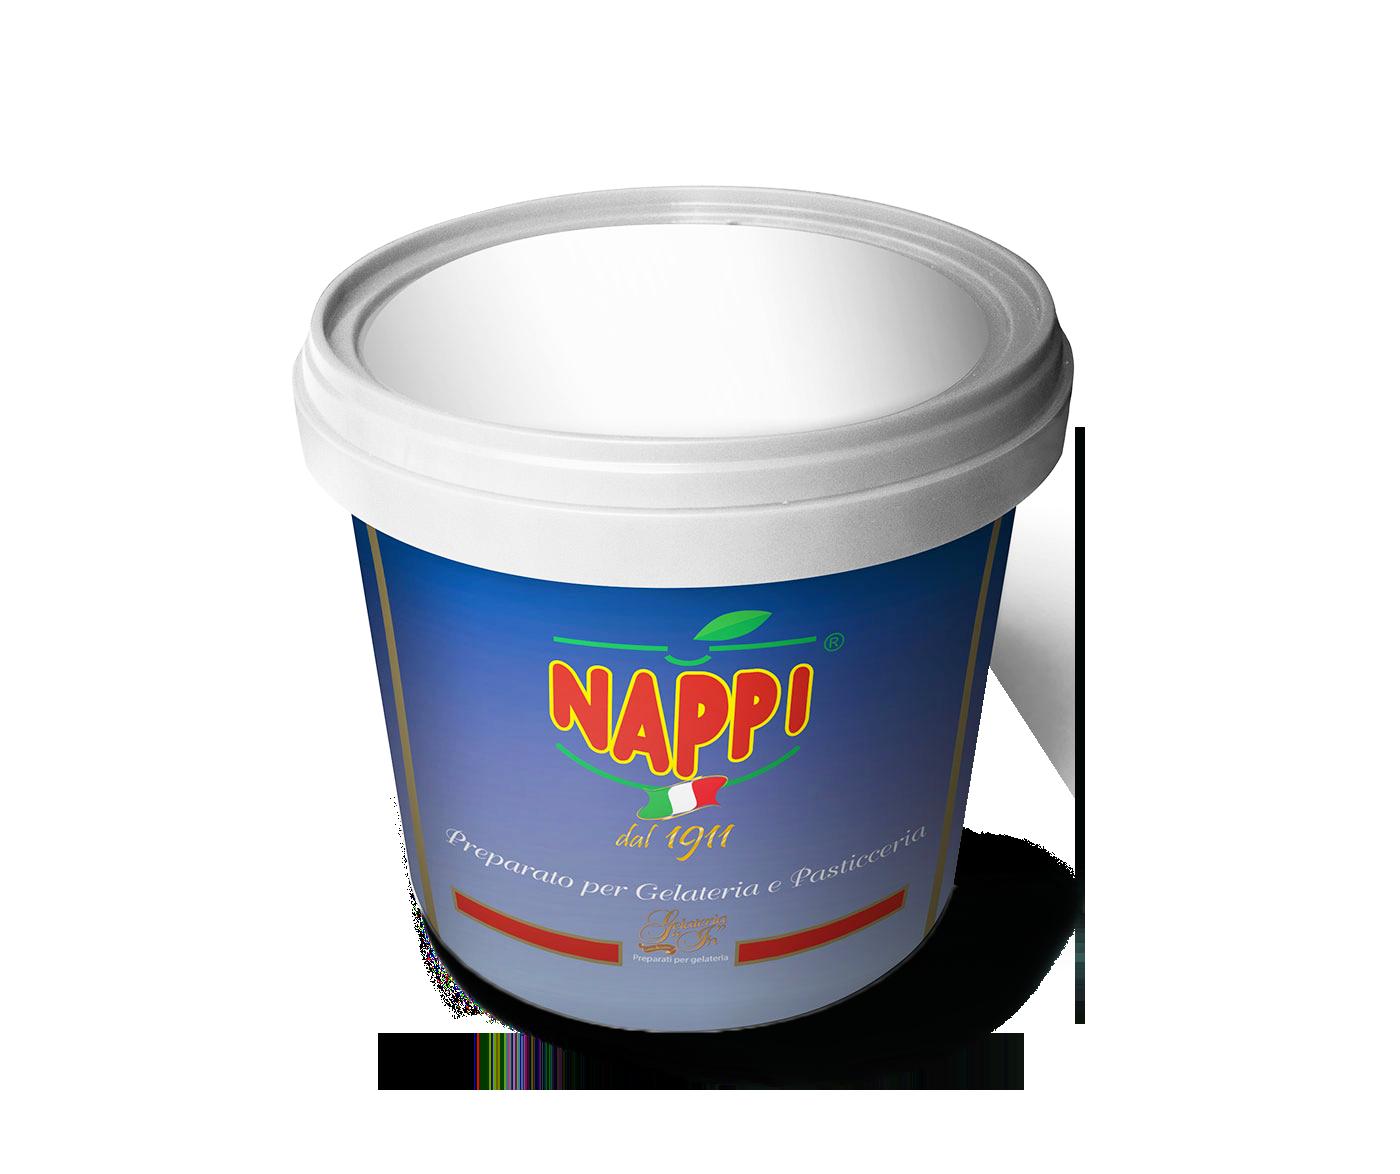 Nappi Caffe Moka 3.5kg pail